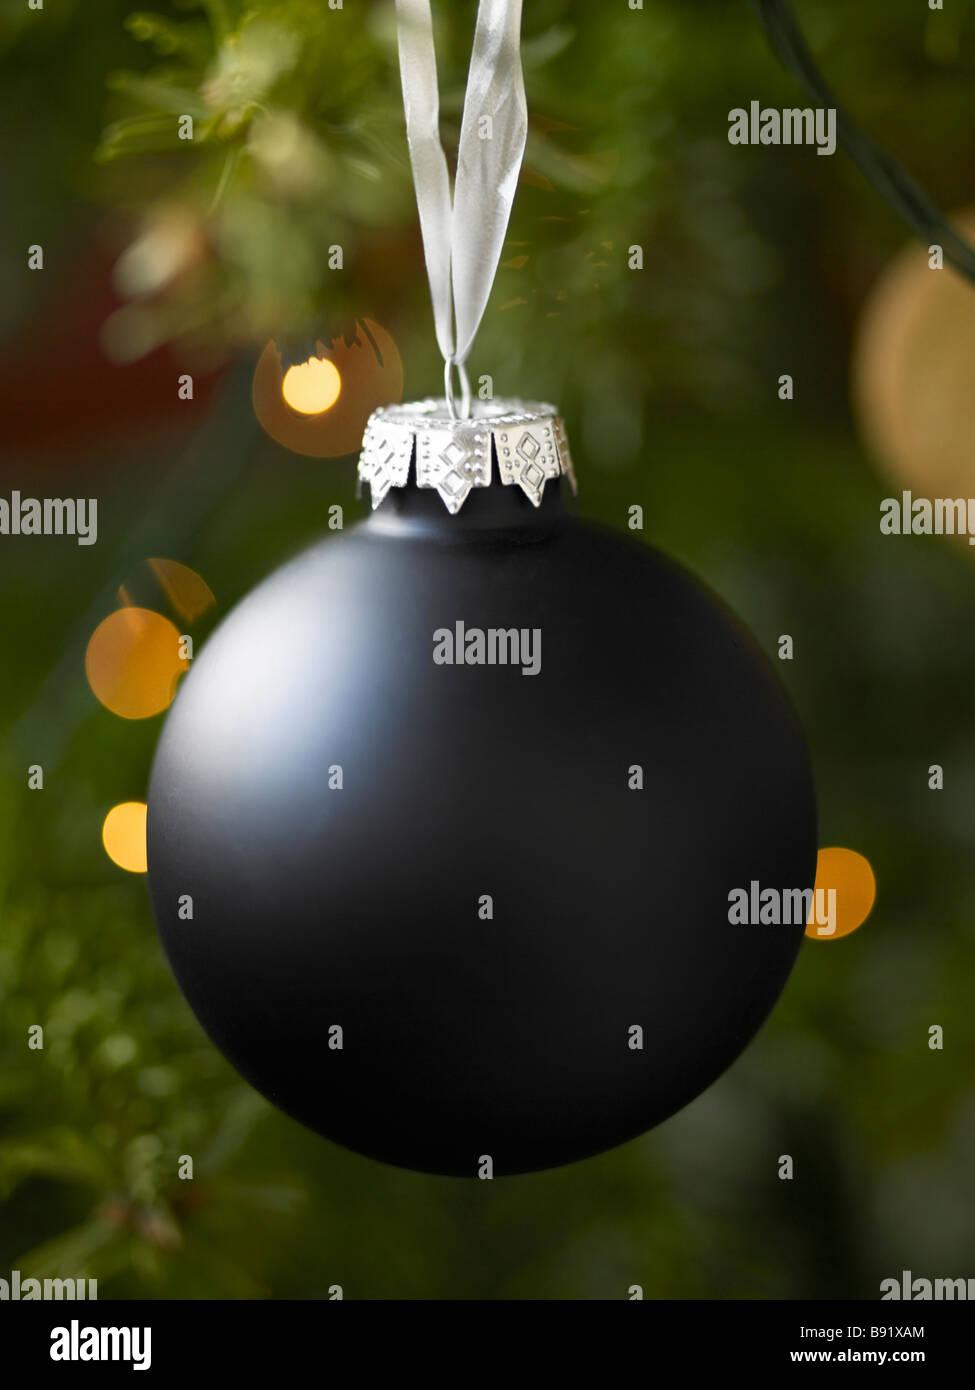 A black Christmas decoration Sweden. - Stock Image